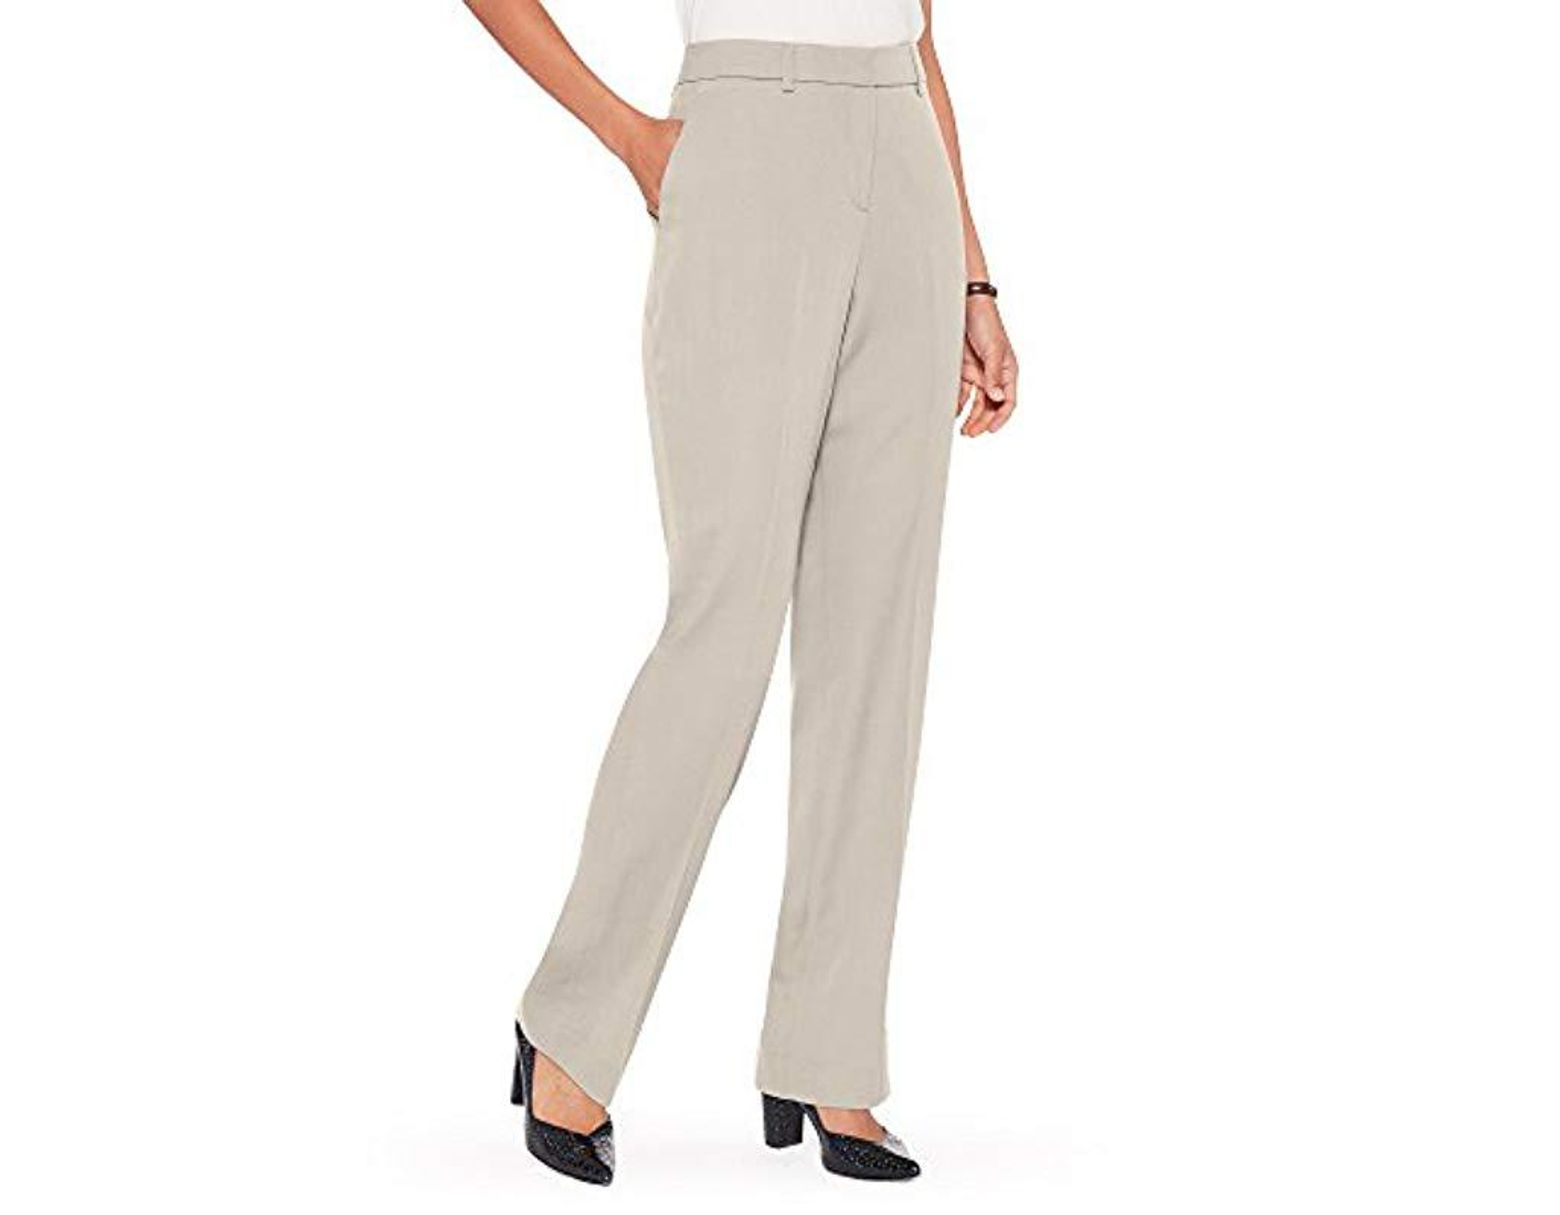 Pendleton Womens Petite Size Reed Knit Pant